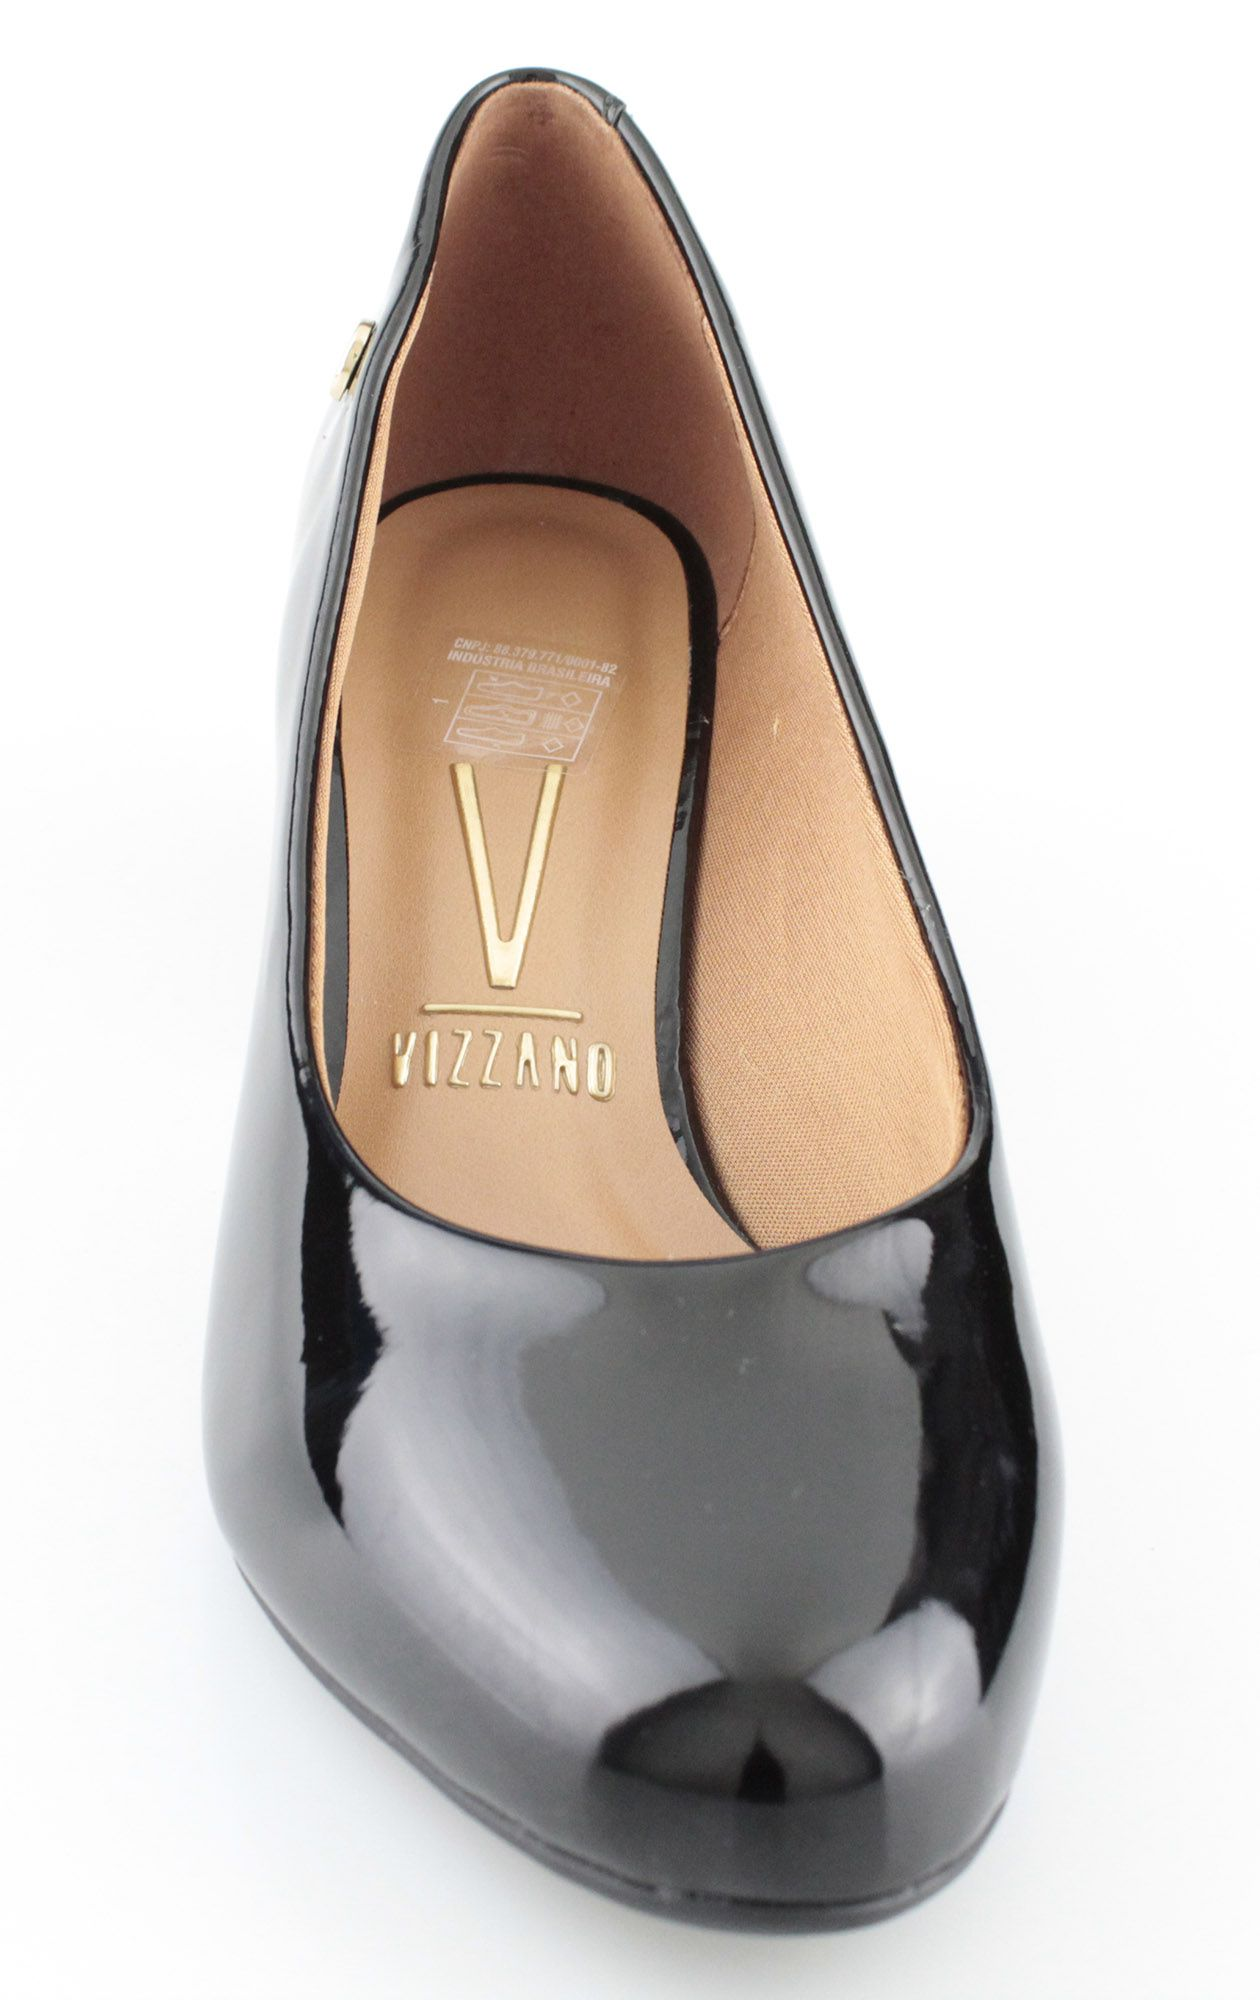 Sapato Feminino Vizzano Preto Verniz Cristal Brilho 1258.100